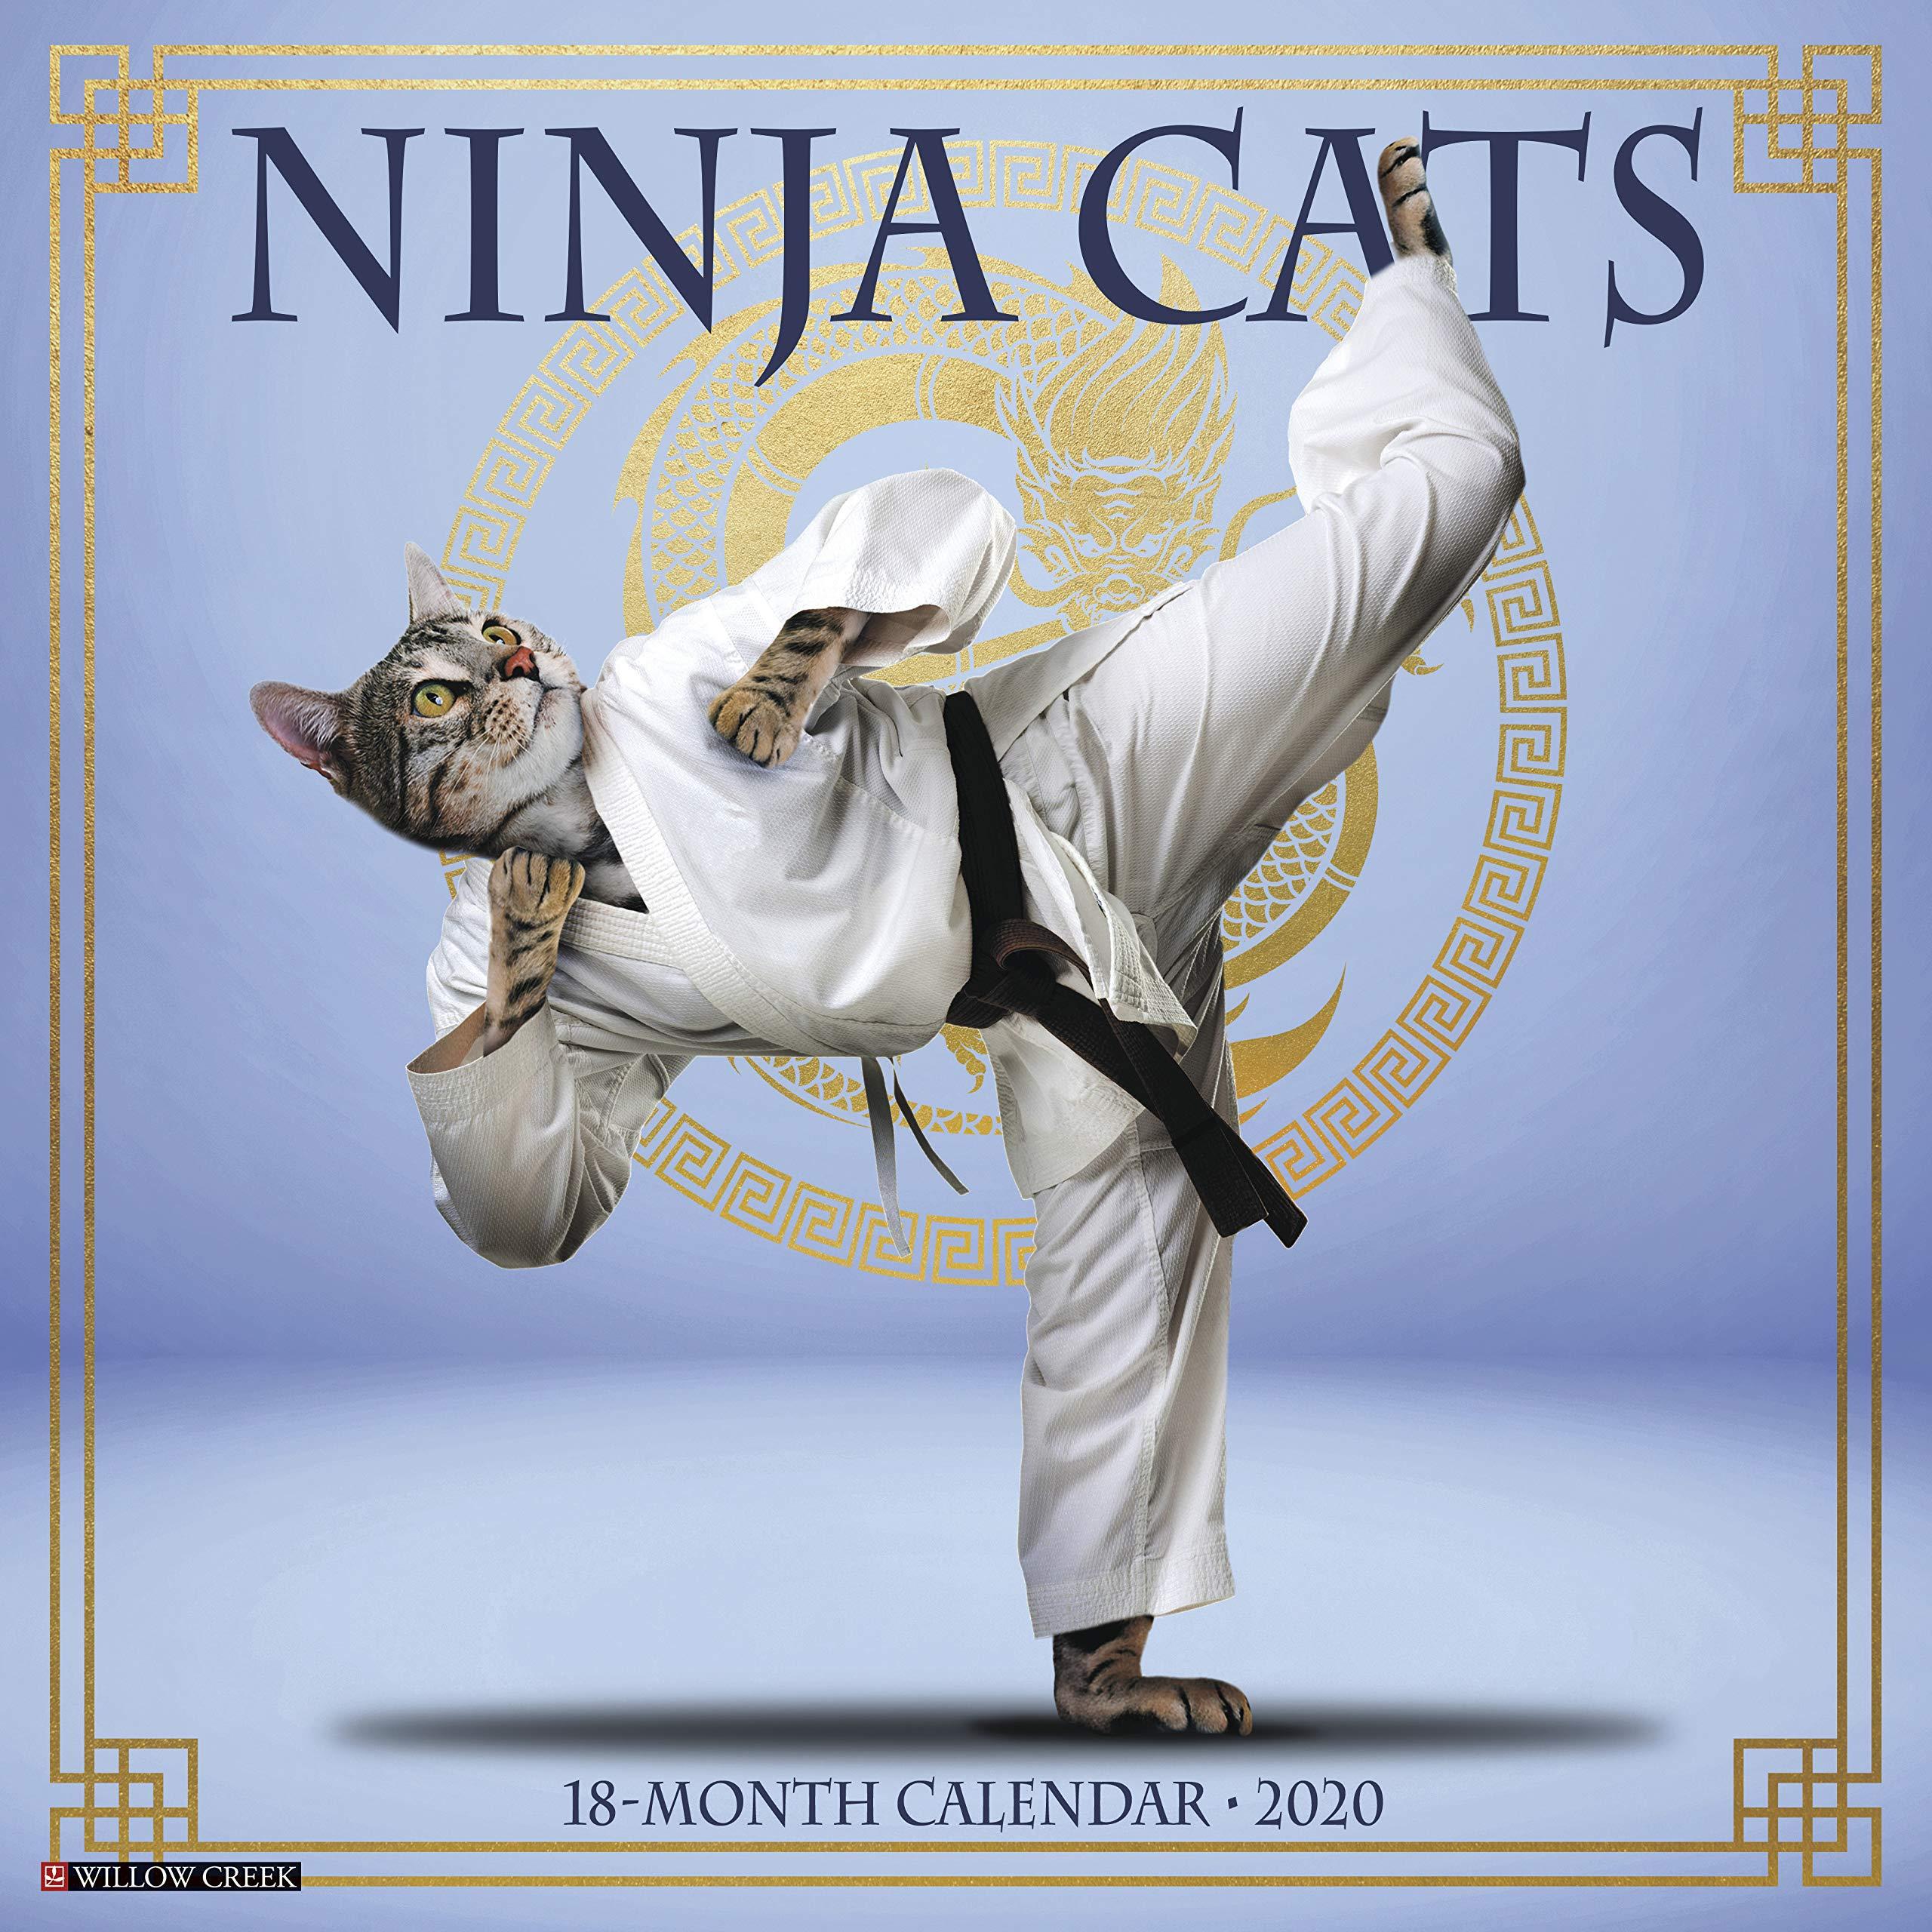 Amazon.com: Ninja Cats 2020 Wall Calendar (9781549207280 ...